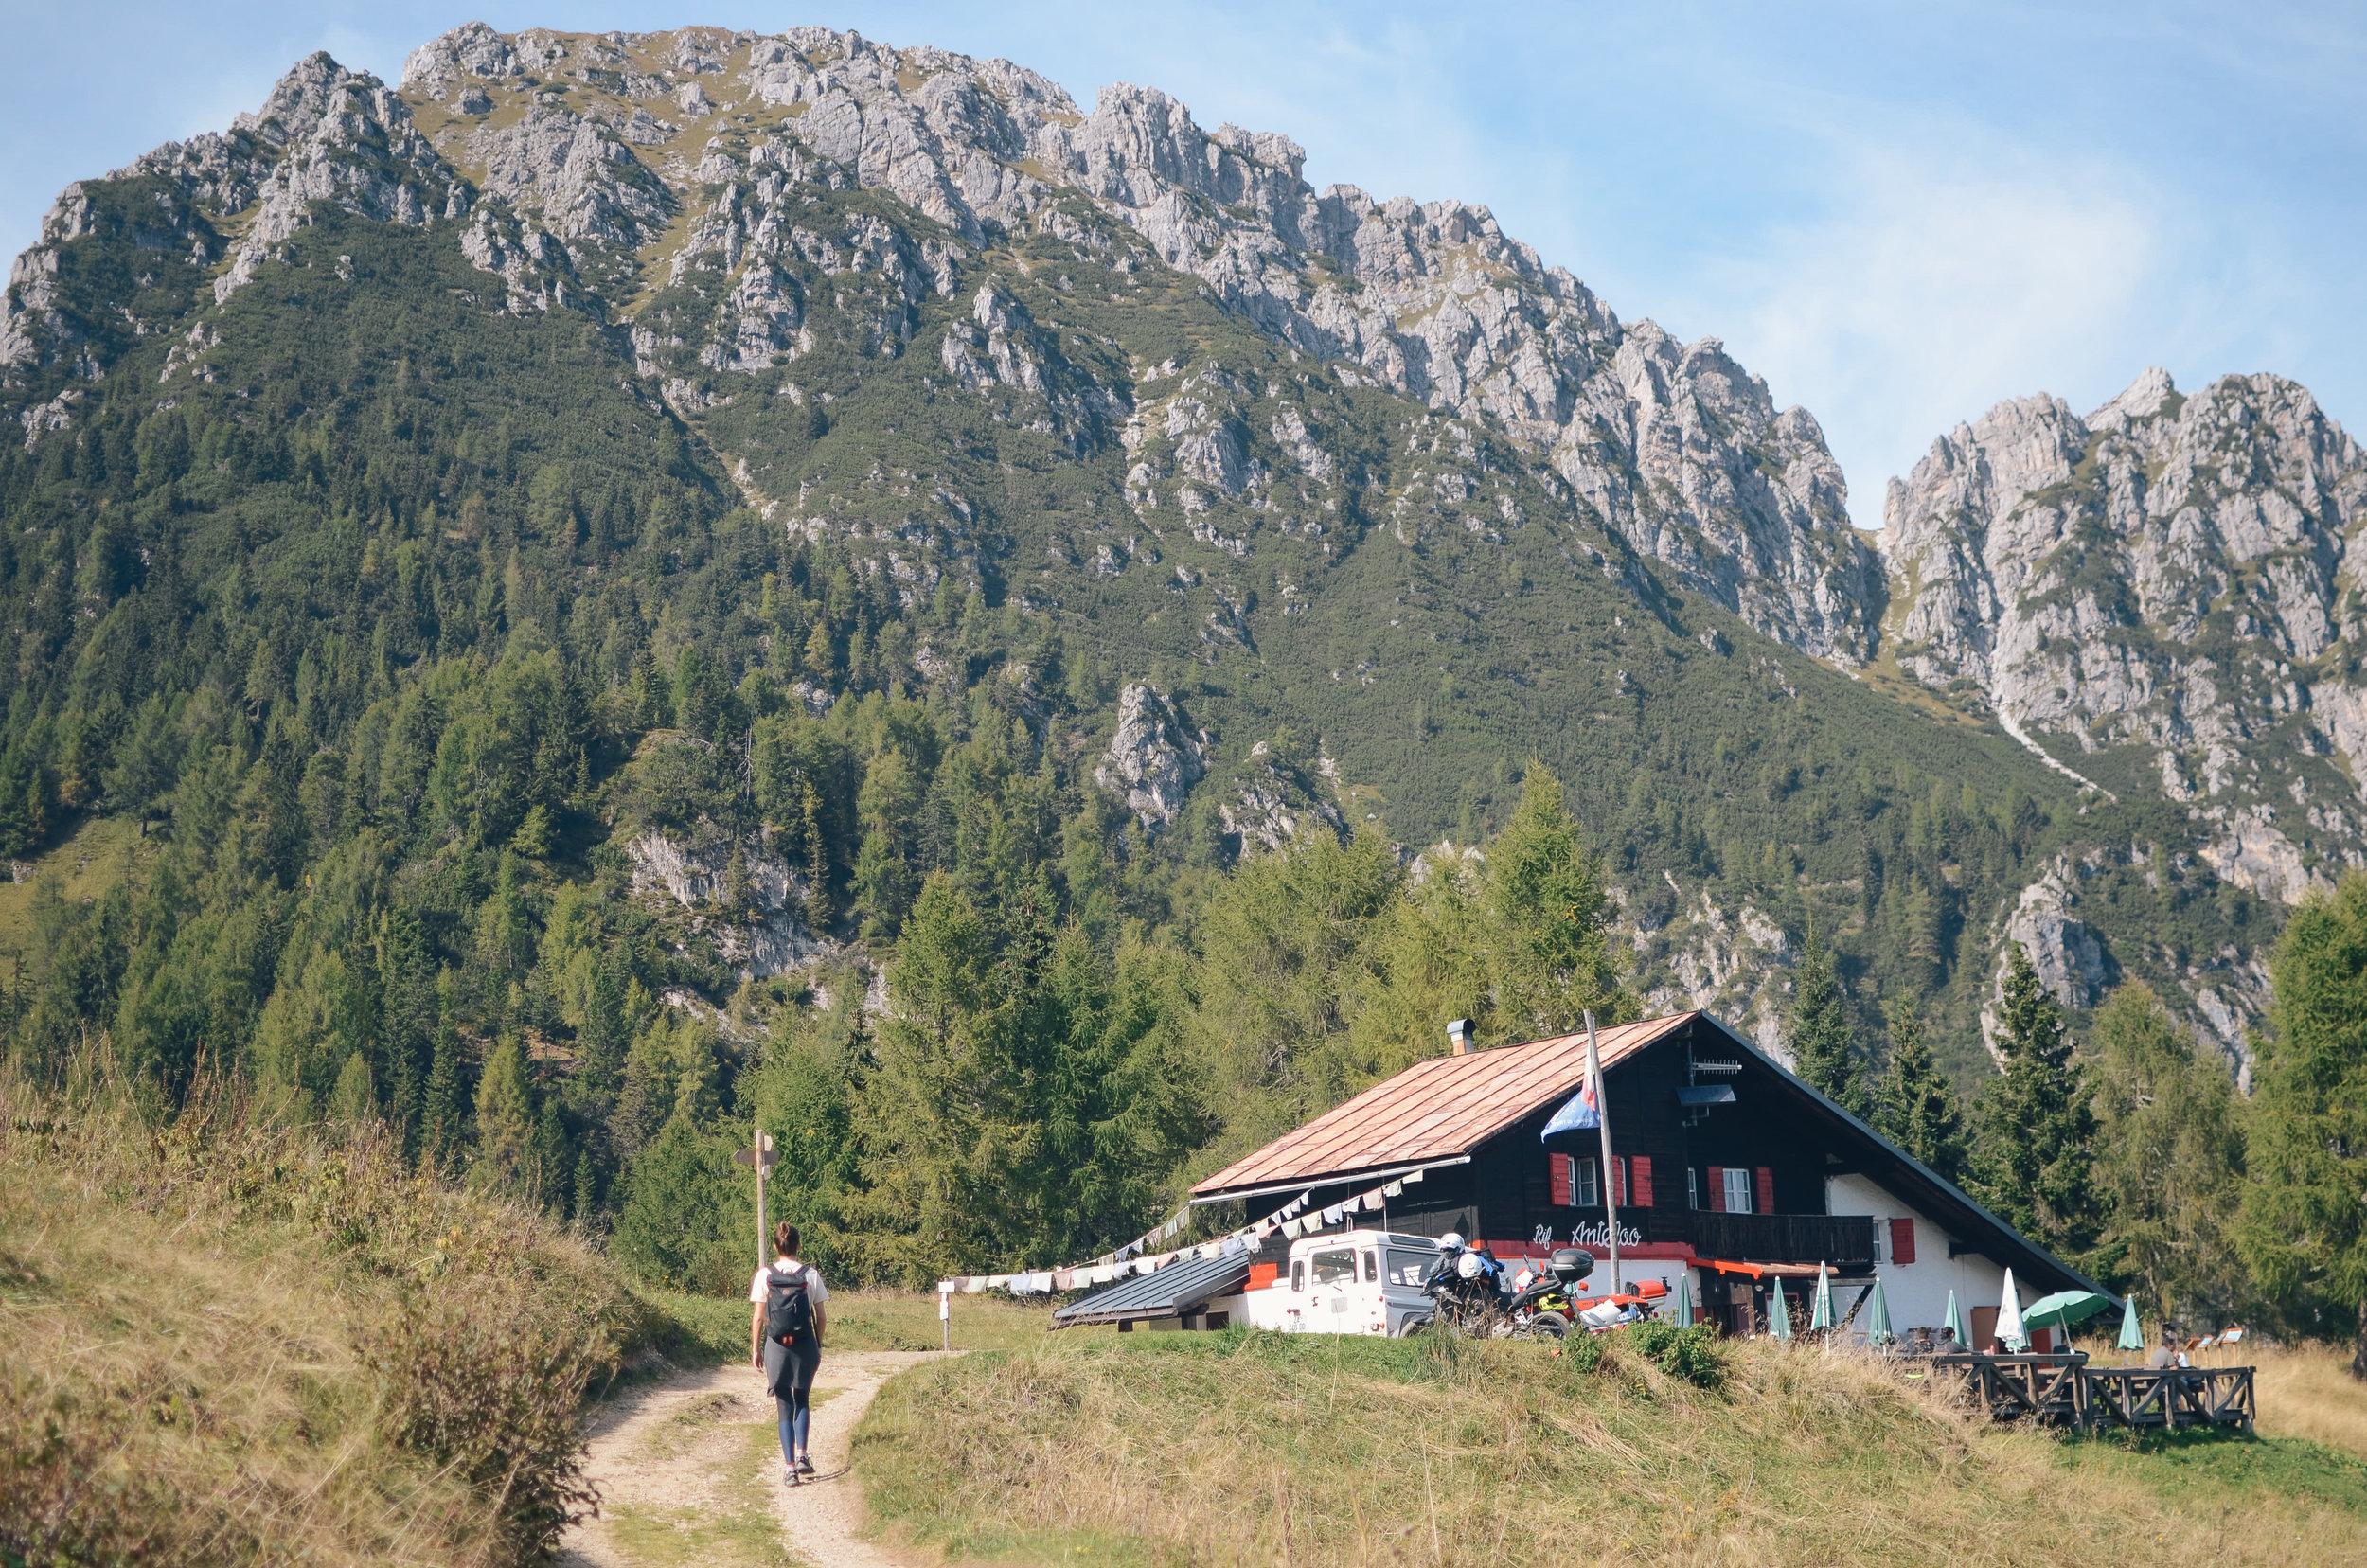 adventure-in-italy-3-hikes-dolomites-hiking-travel-blog-tyrol-6.jpg